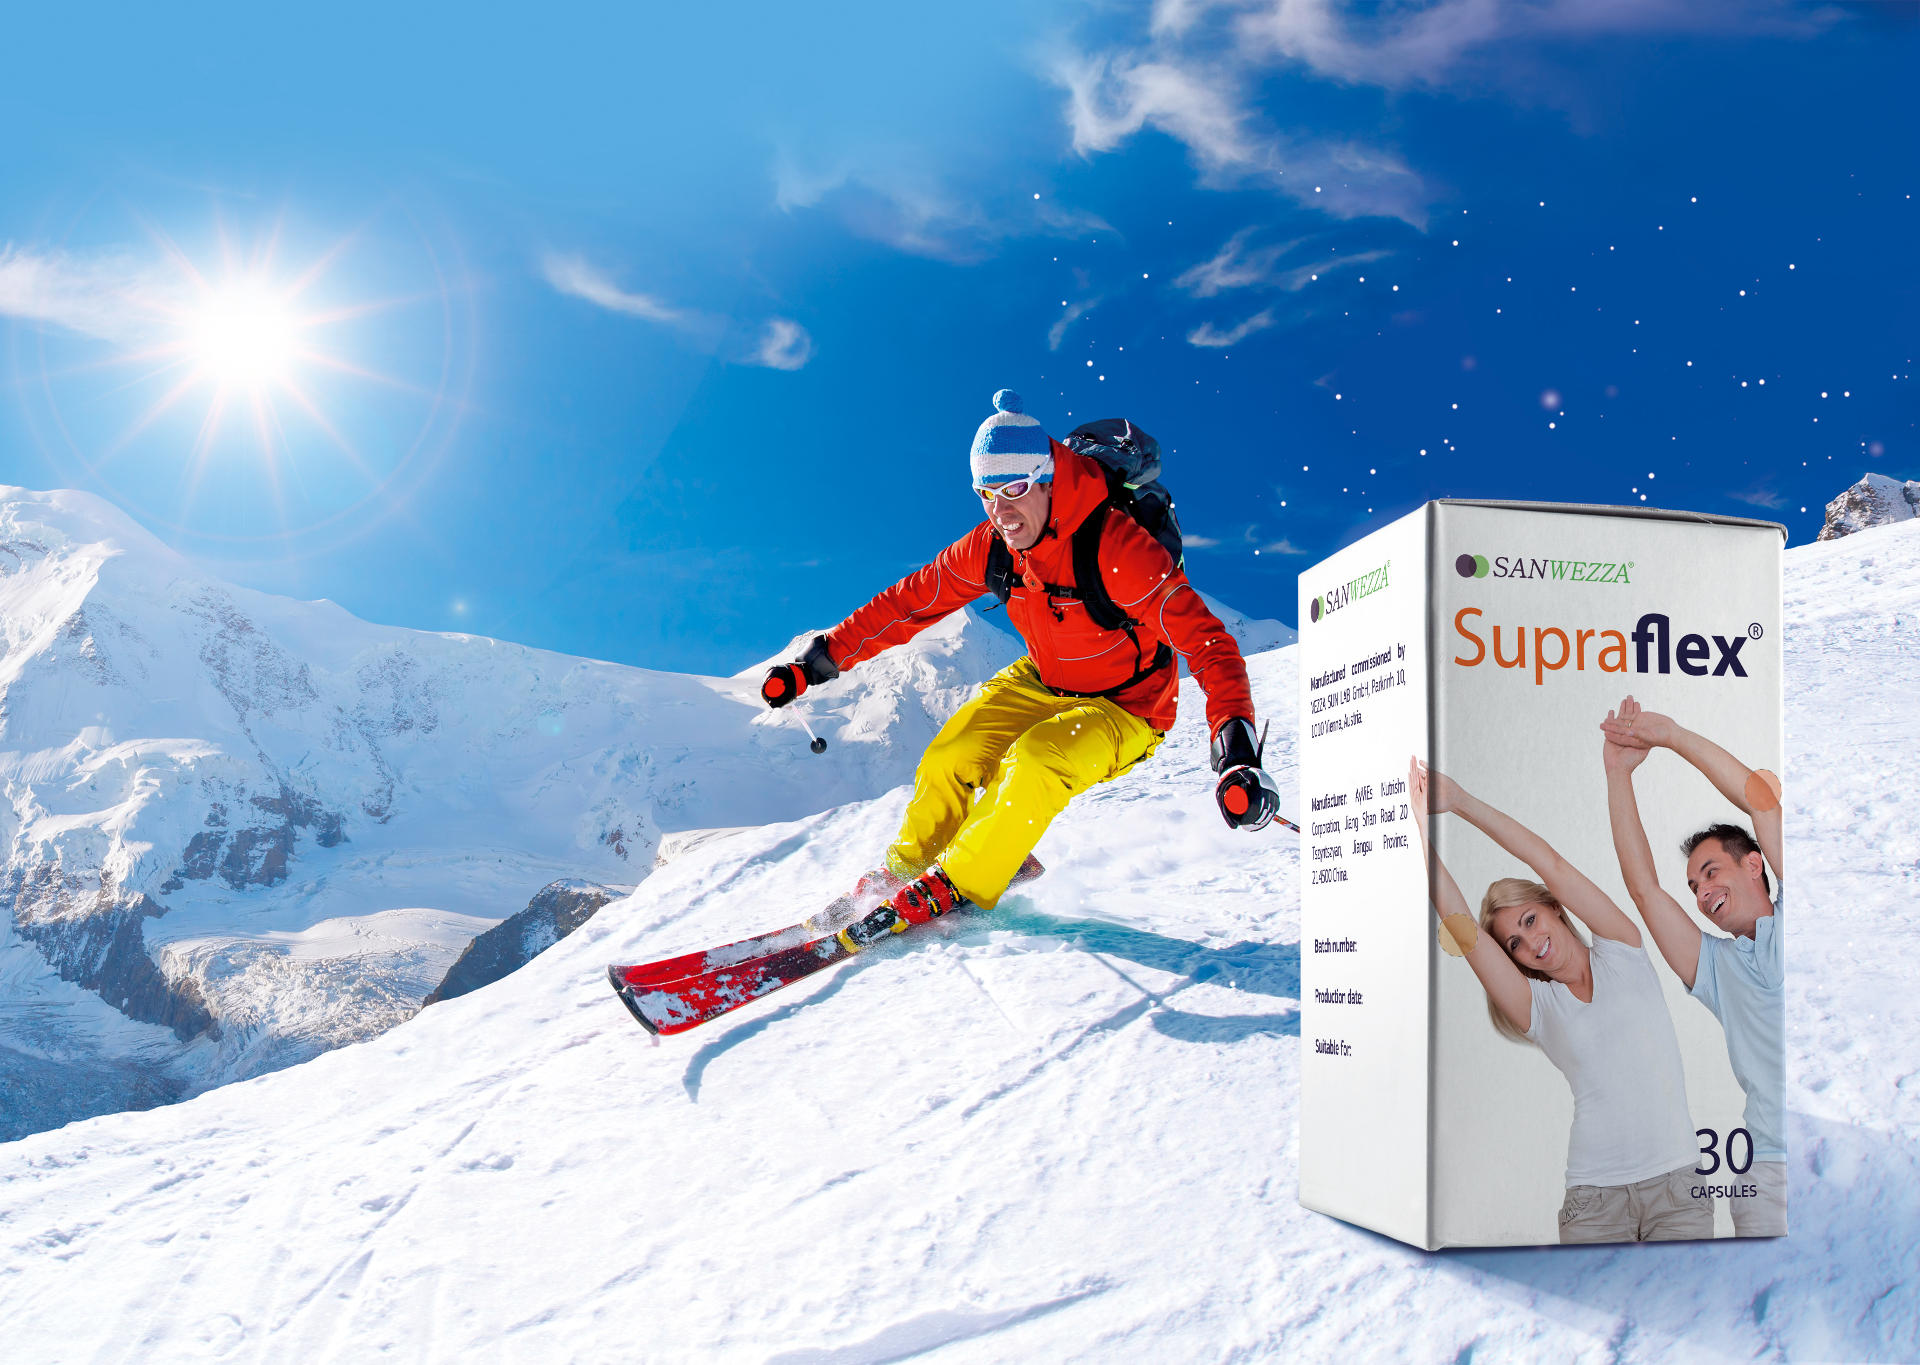 Фармацевтическая упаковка Супрафлекс дизайн, Supraflex pharmacy packaging design